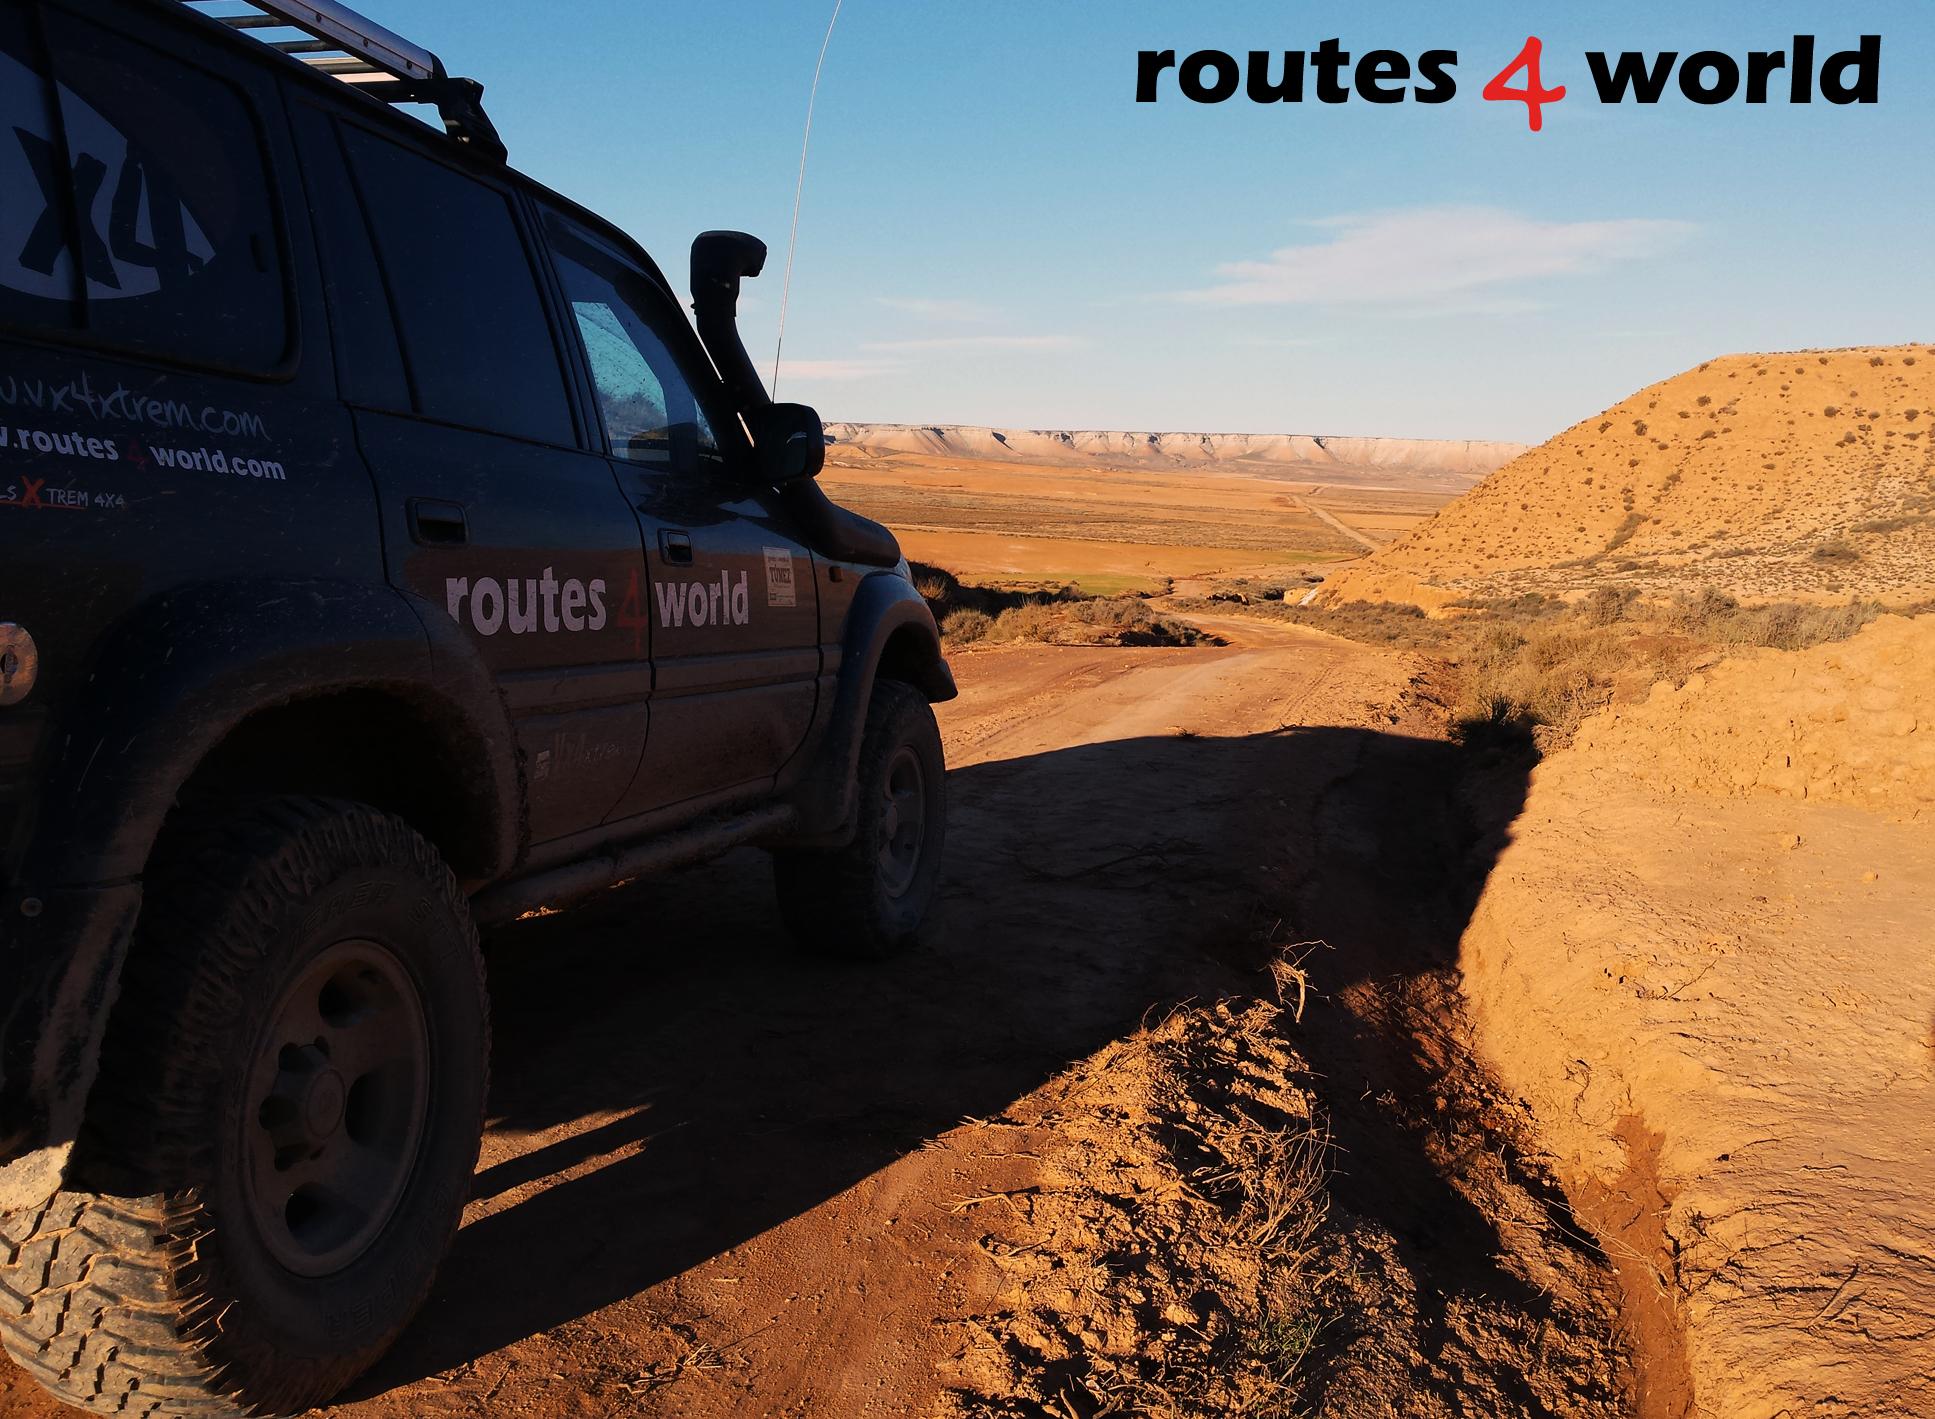 Monegros R4W - routes4world (93)